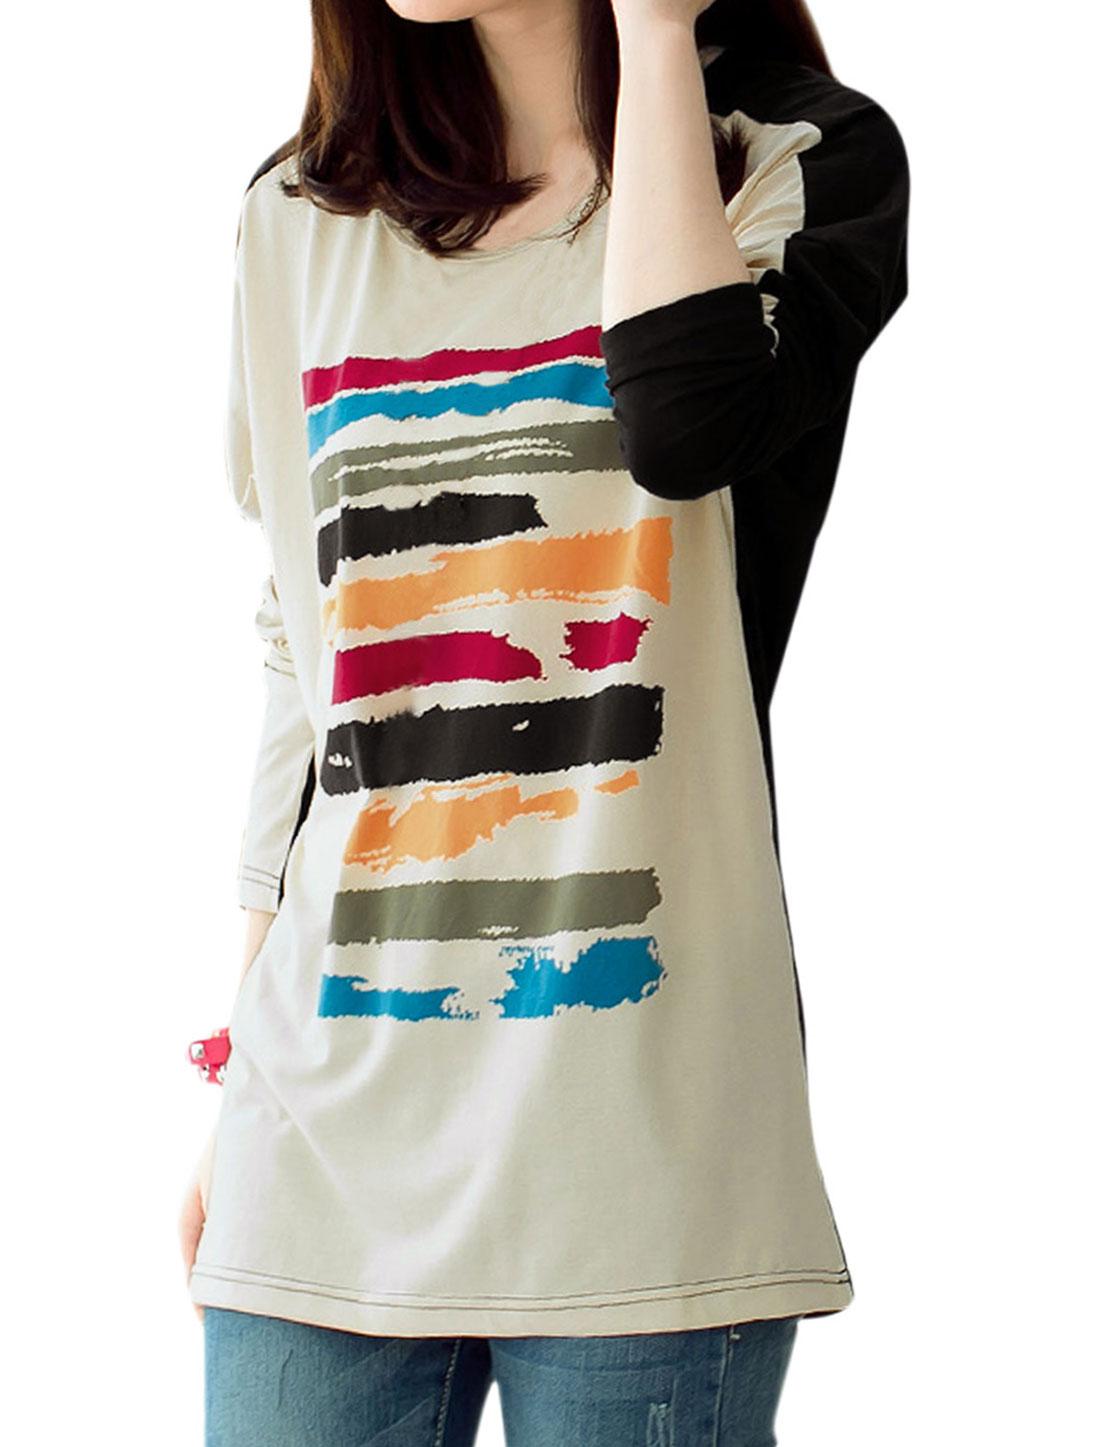 Women Slipover Cape Sleeve Novelty Pattern Loose T-shirt Beige Black L